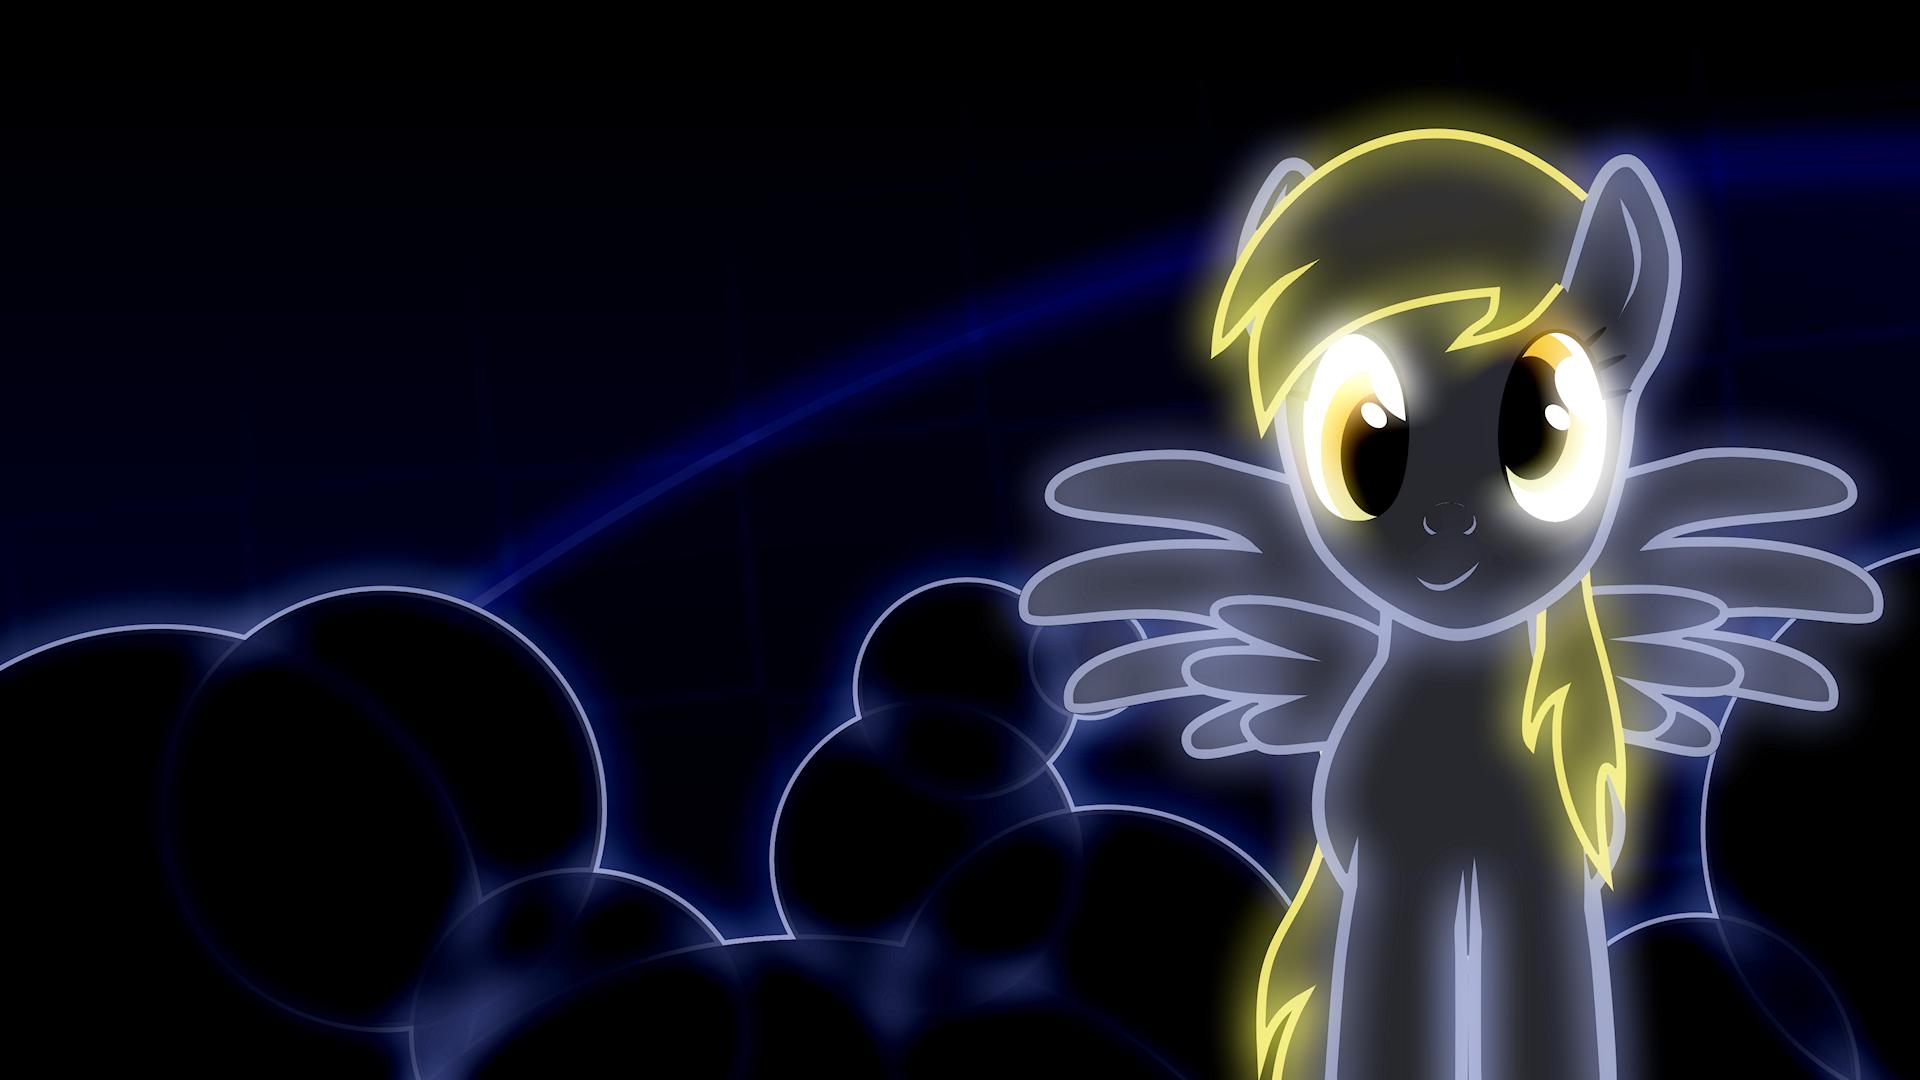 My Little Pony Friendship is Magic Derpy Hooves neon Neon 1920x1080